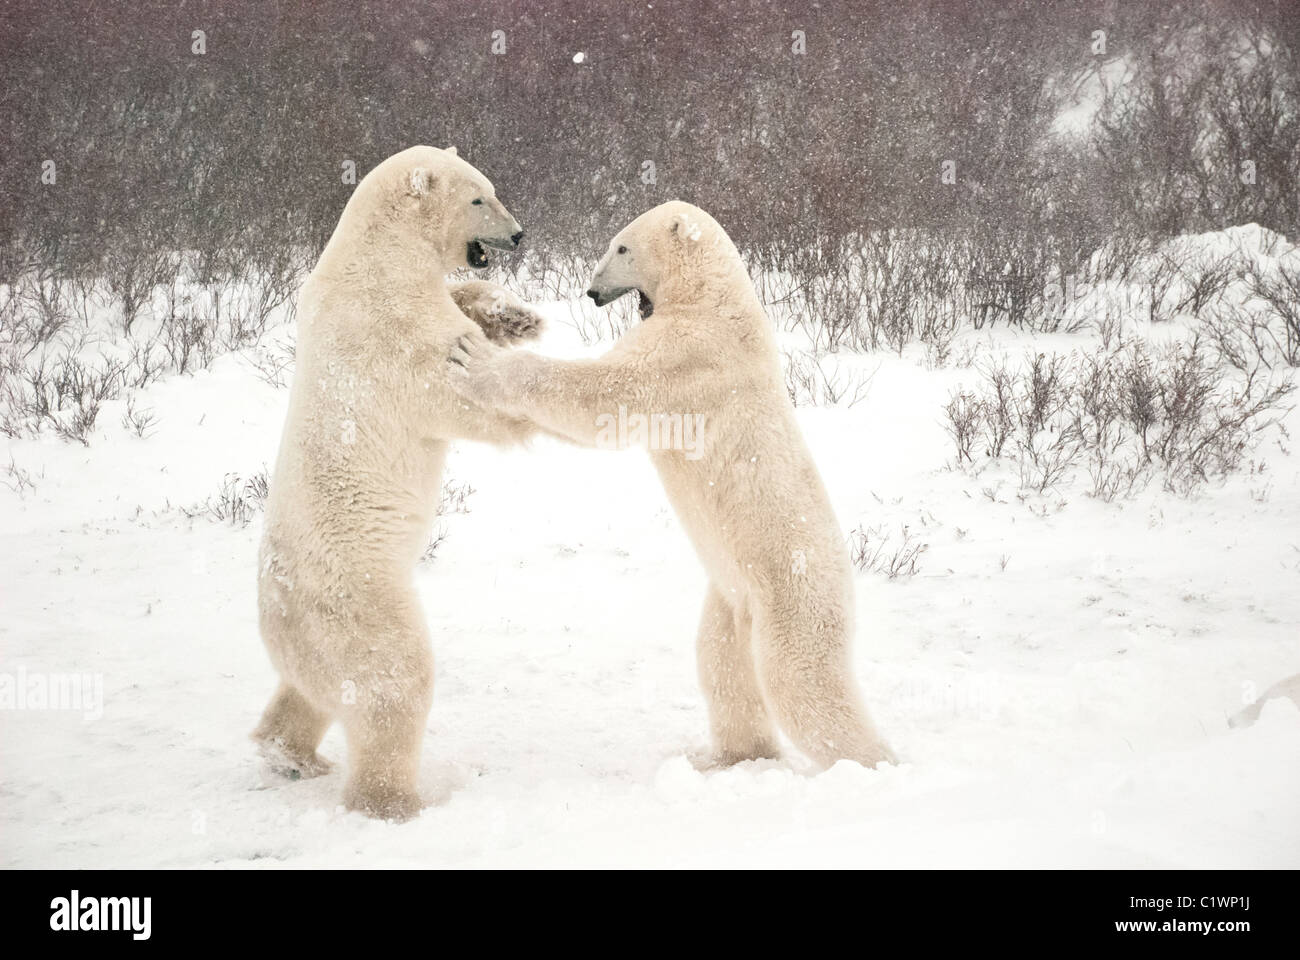 Polar Bears, Ursus maritimus, play fighting, Churchill, Manitoba, Canada - Stock Image